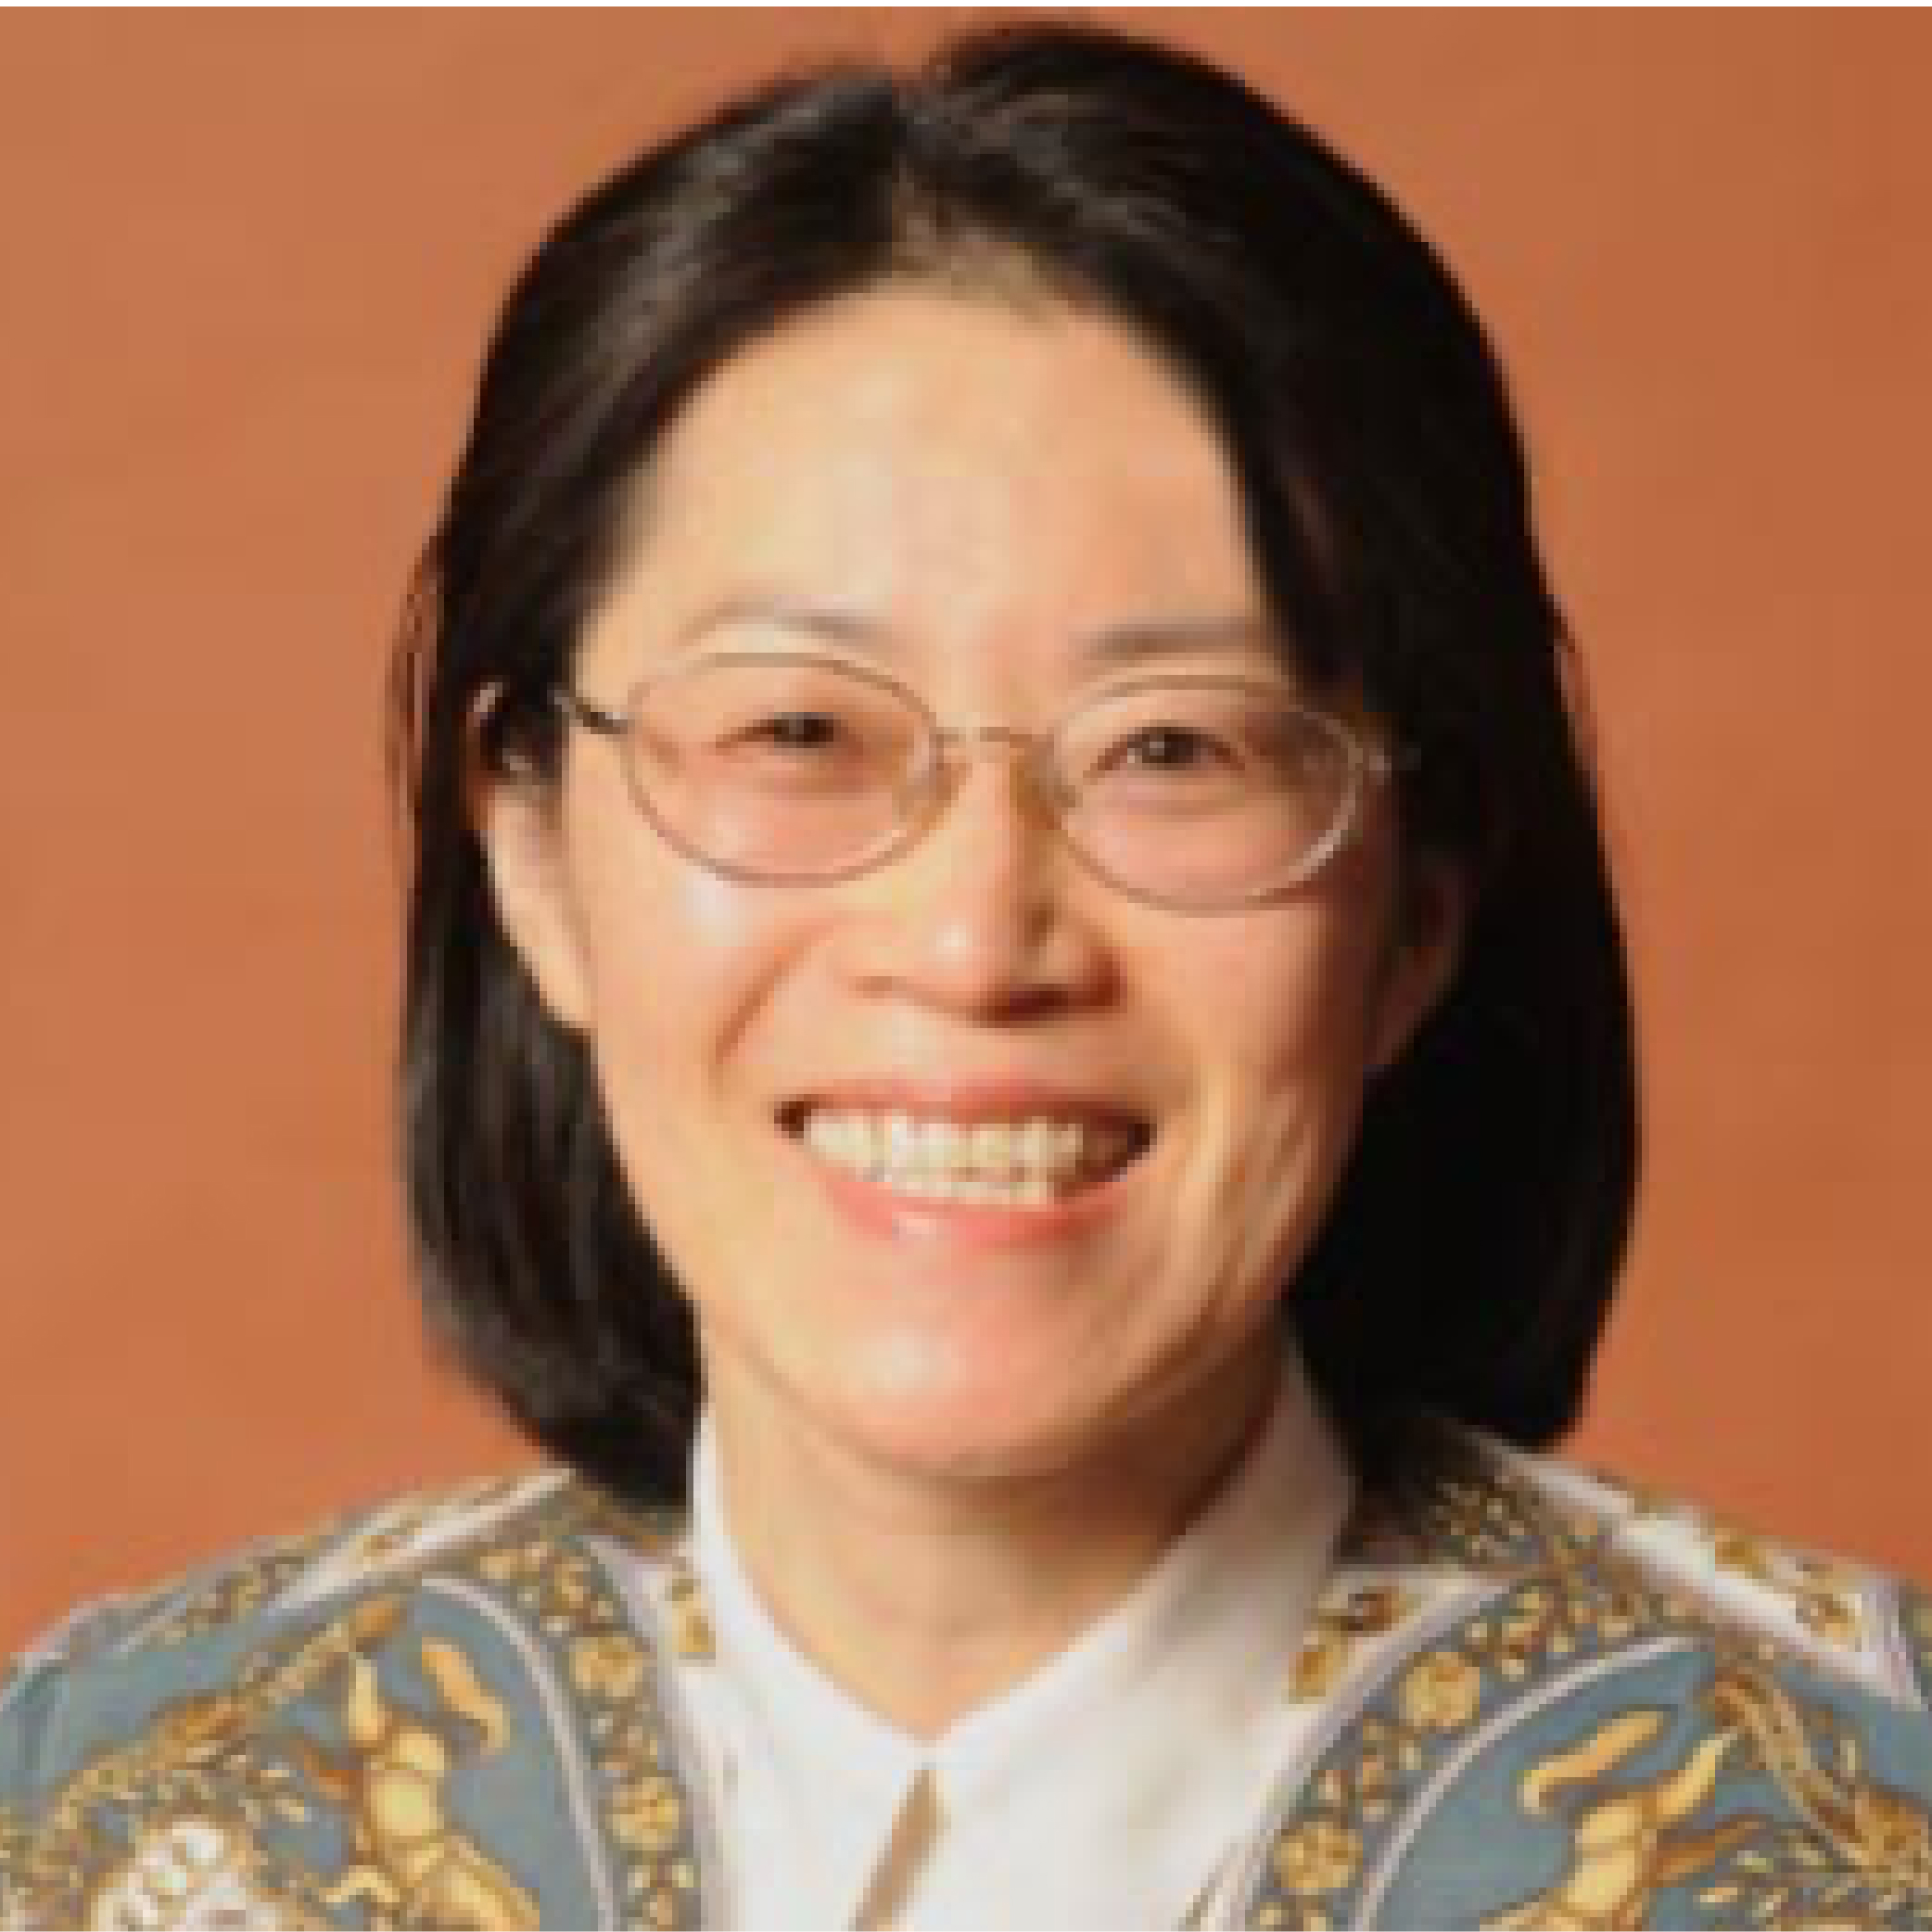 portrait of Seung Ai Yang